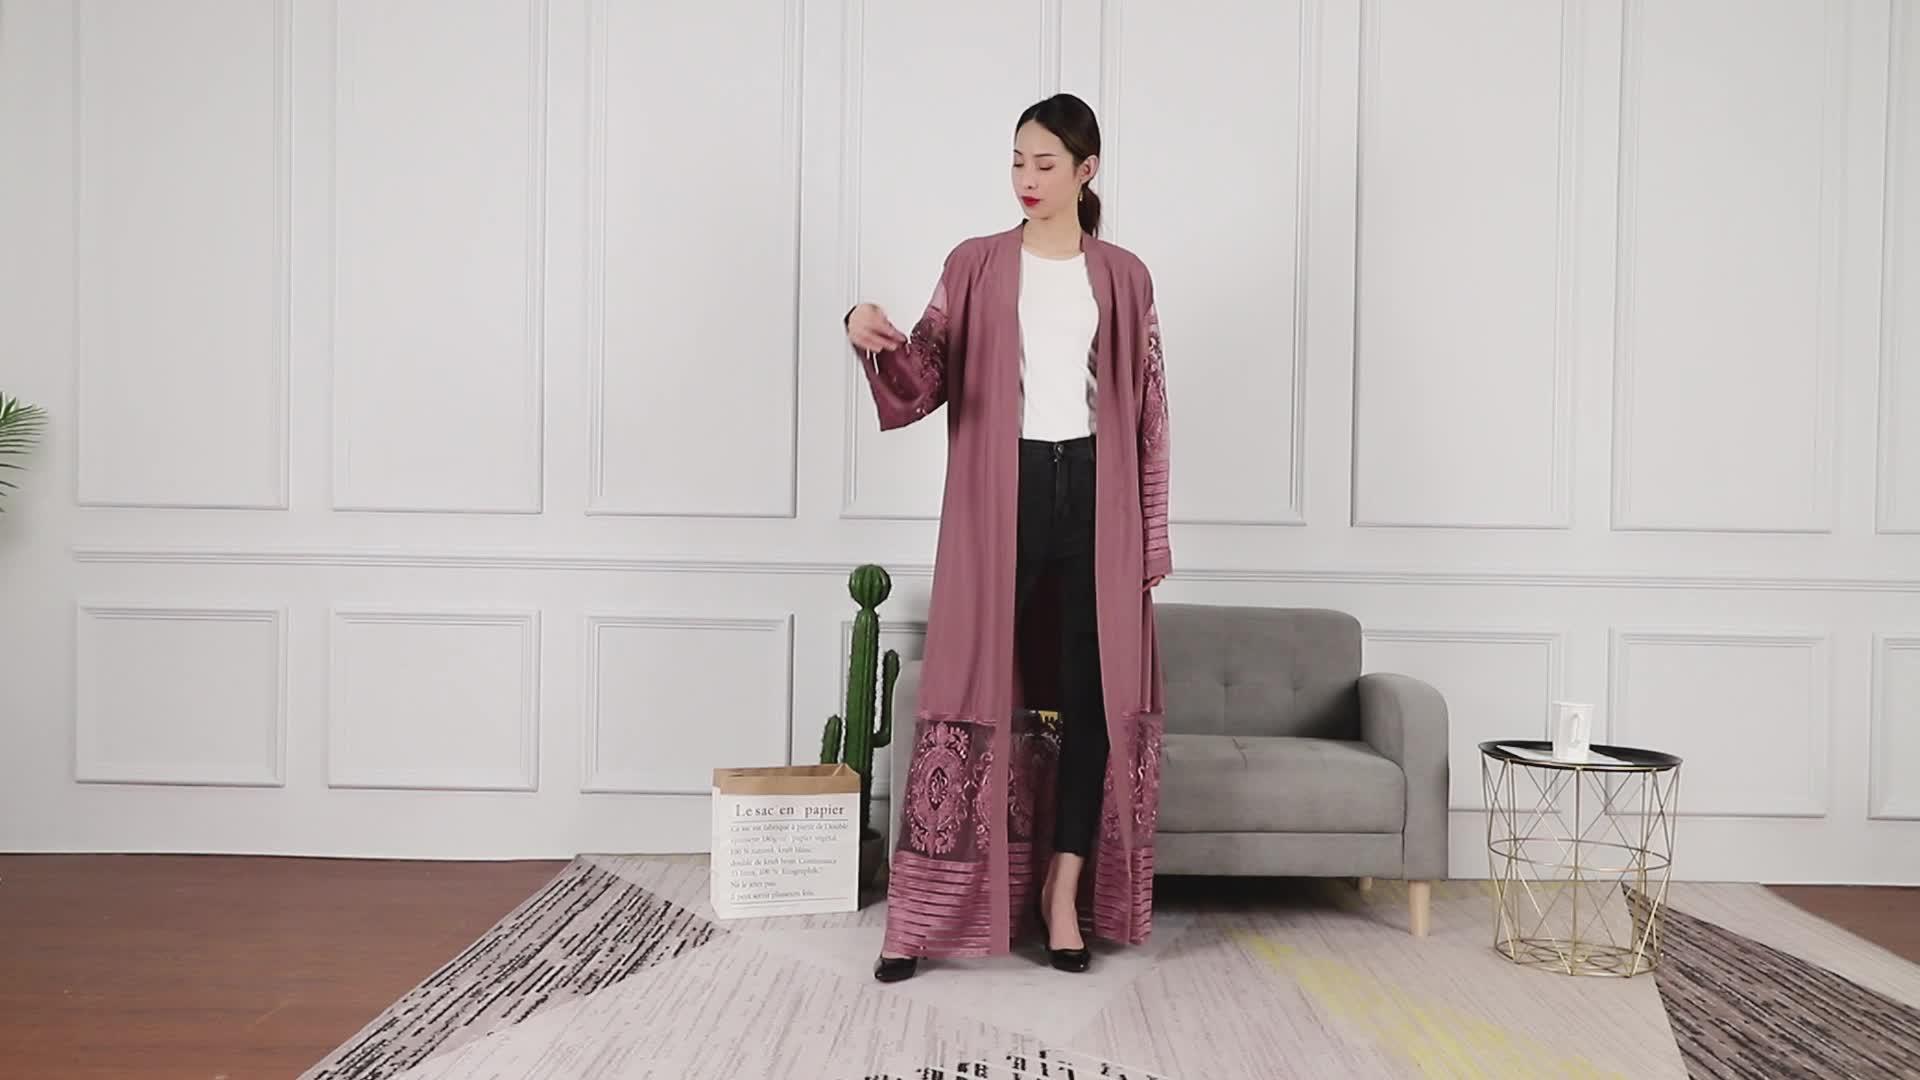 1546 # Hot selling modest mode islamitische kleding moslim vrouwen jurk dubai abaya 2019